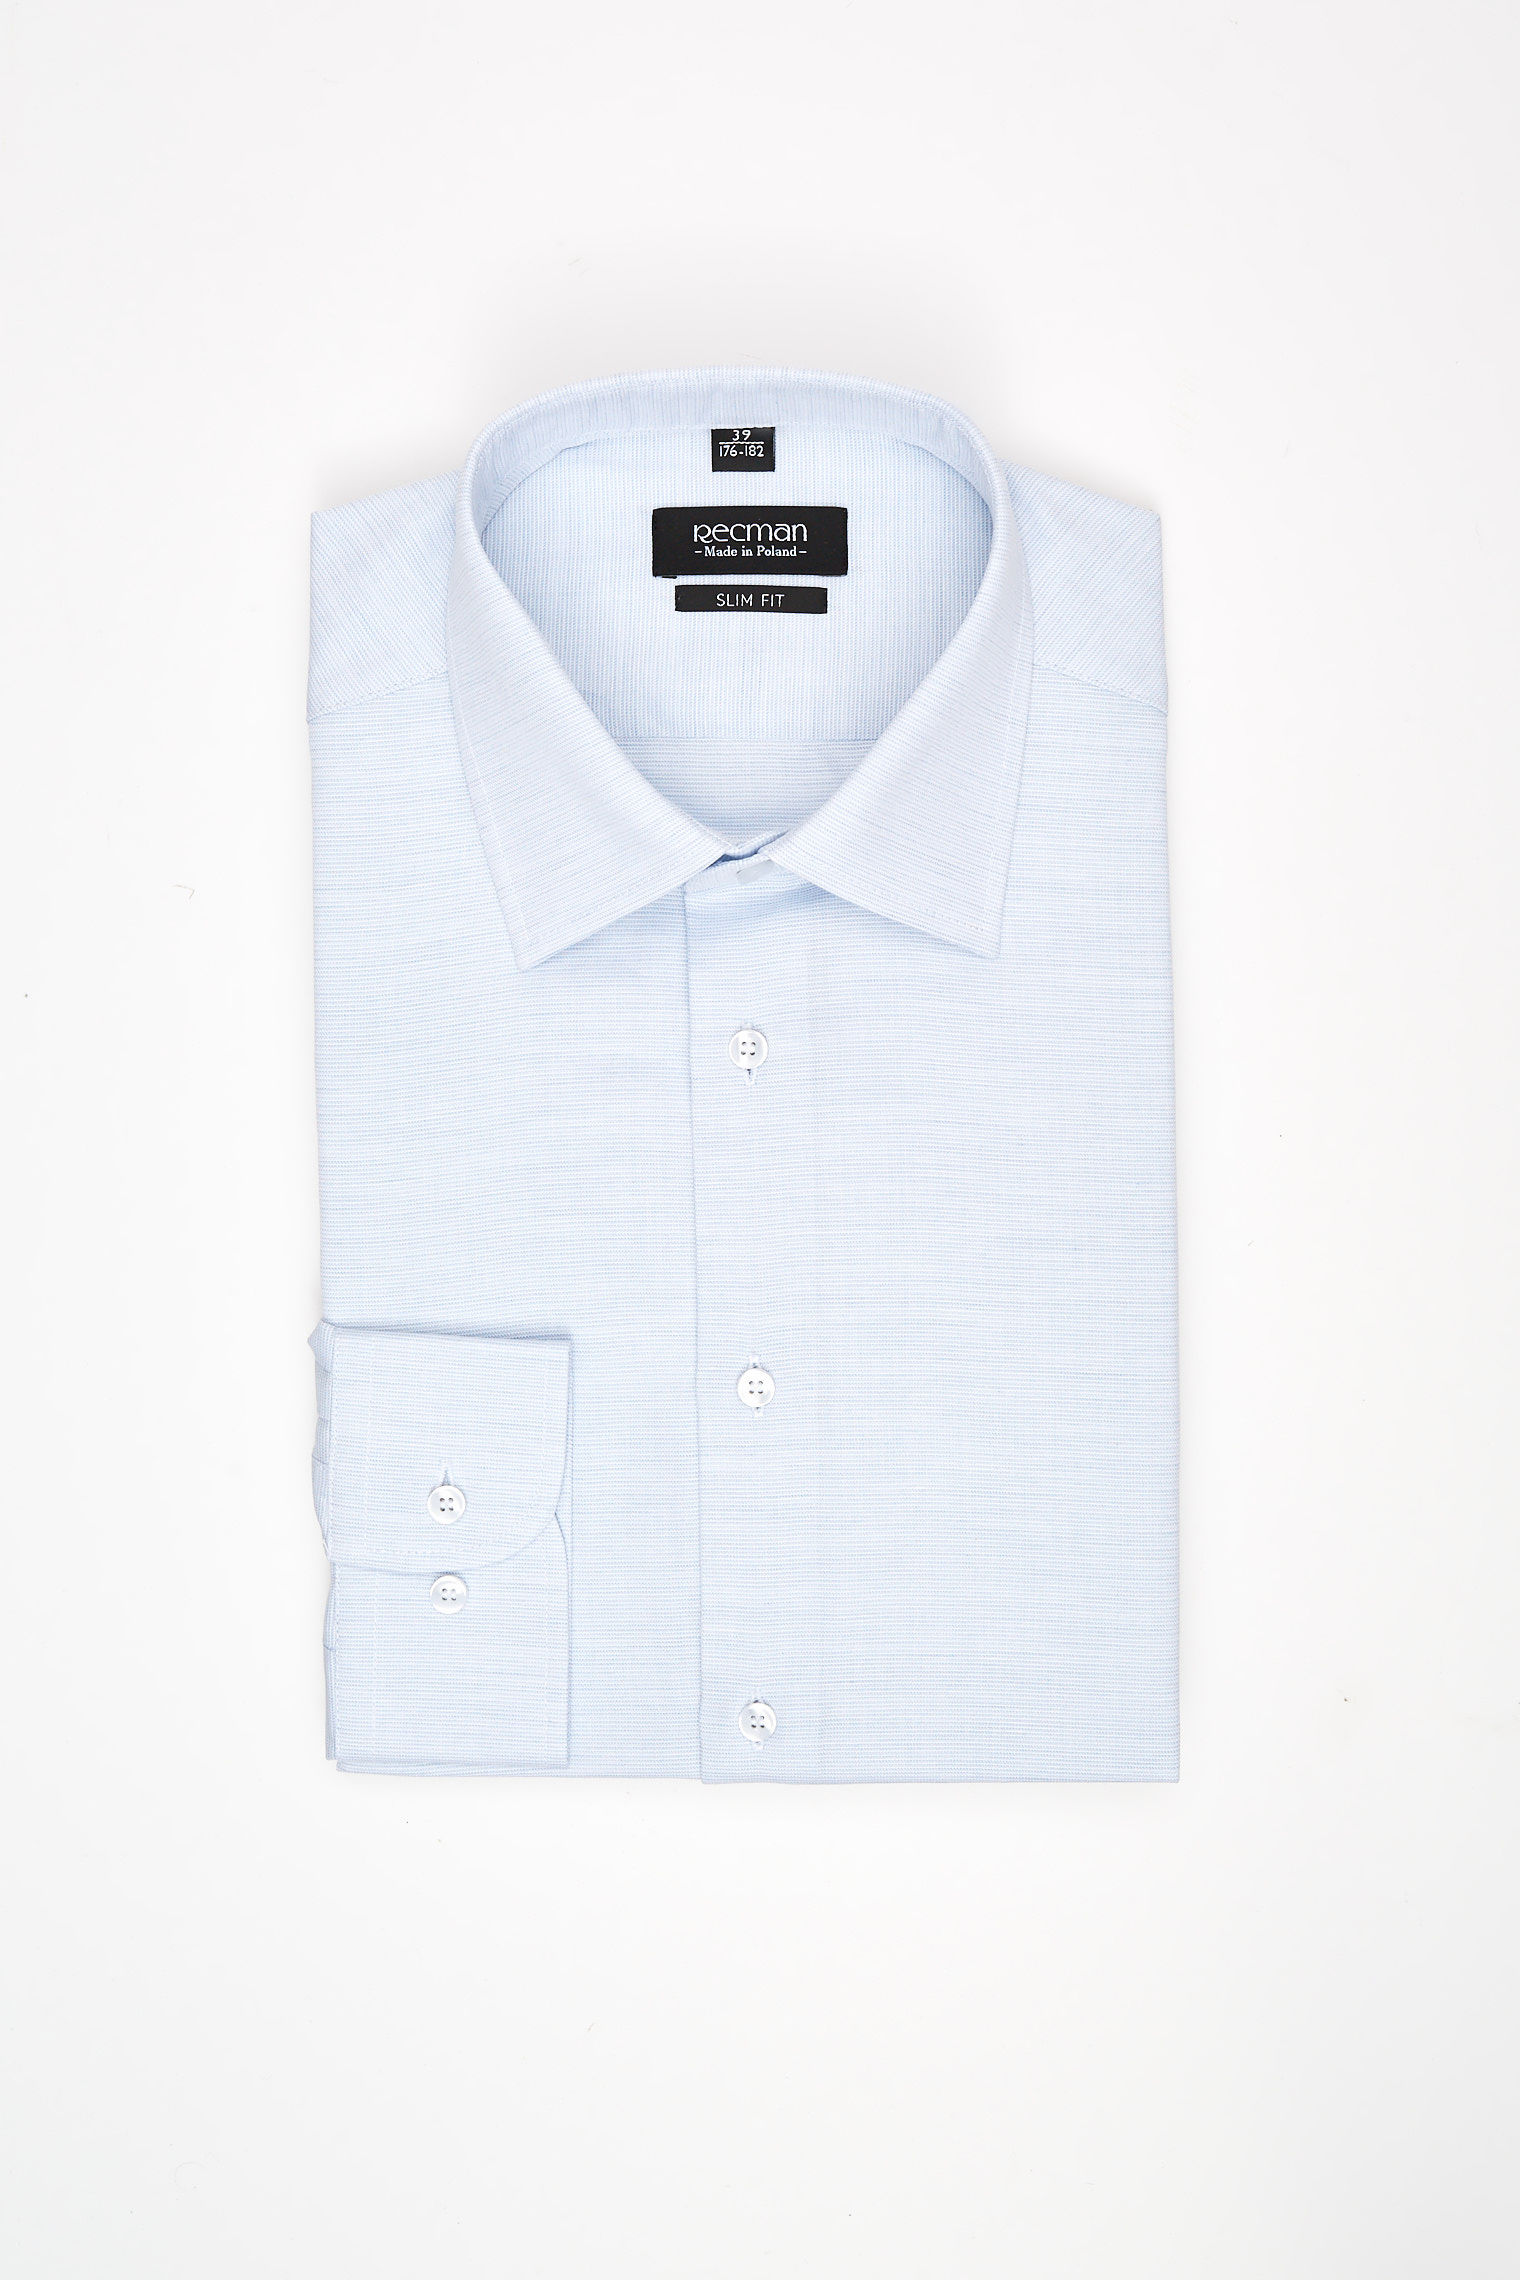 koszula corsini 2993 długi rękaw slim fit błękit